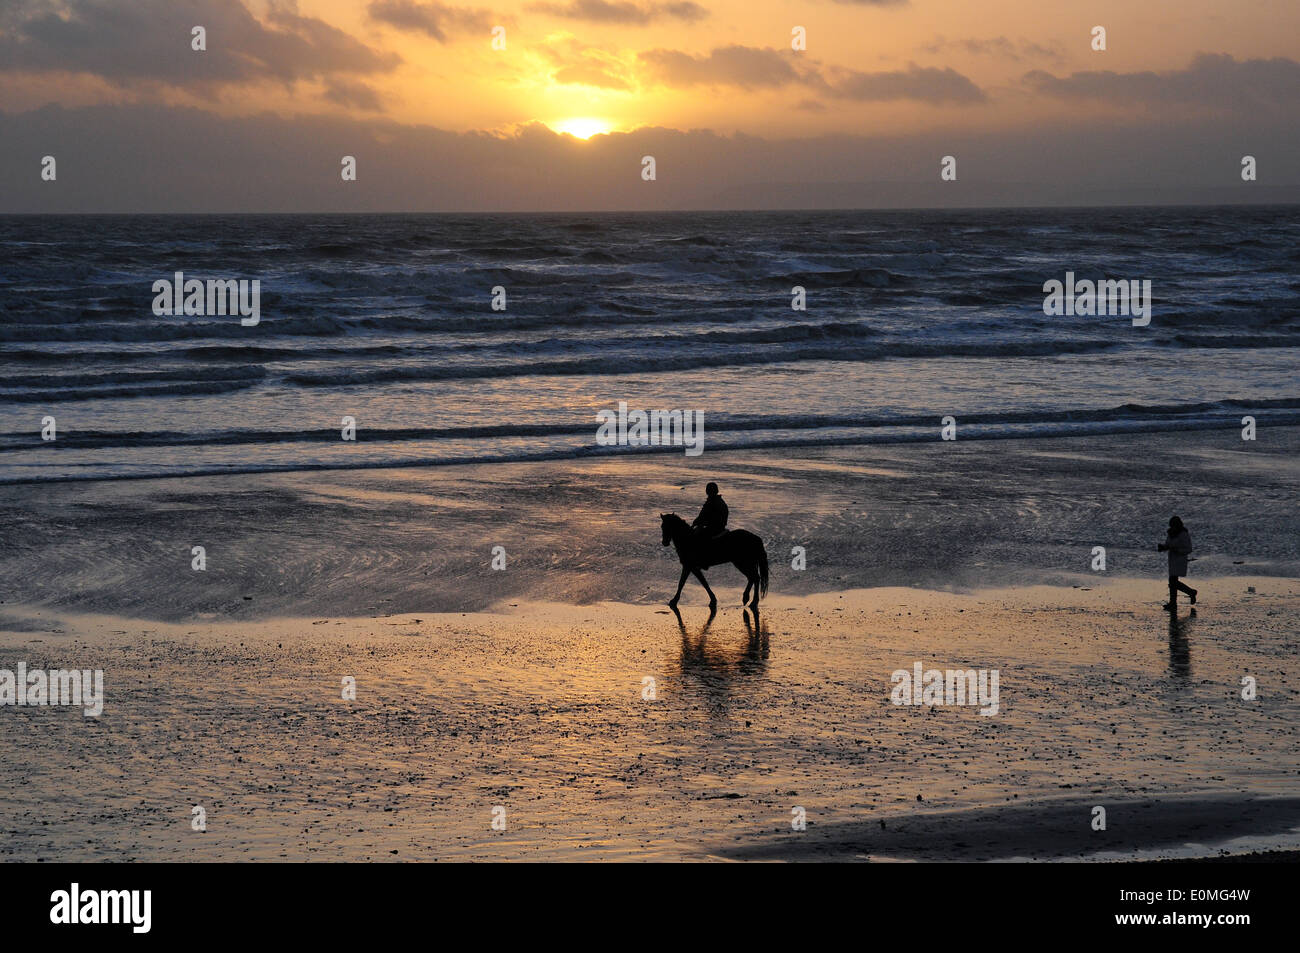 Horse and rider and pedestrian on Bracklesham Bay Beach. Sunset. - Stock Image